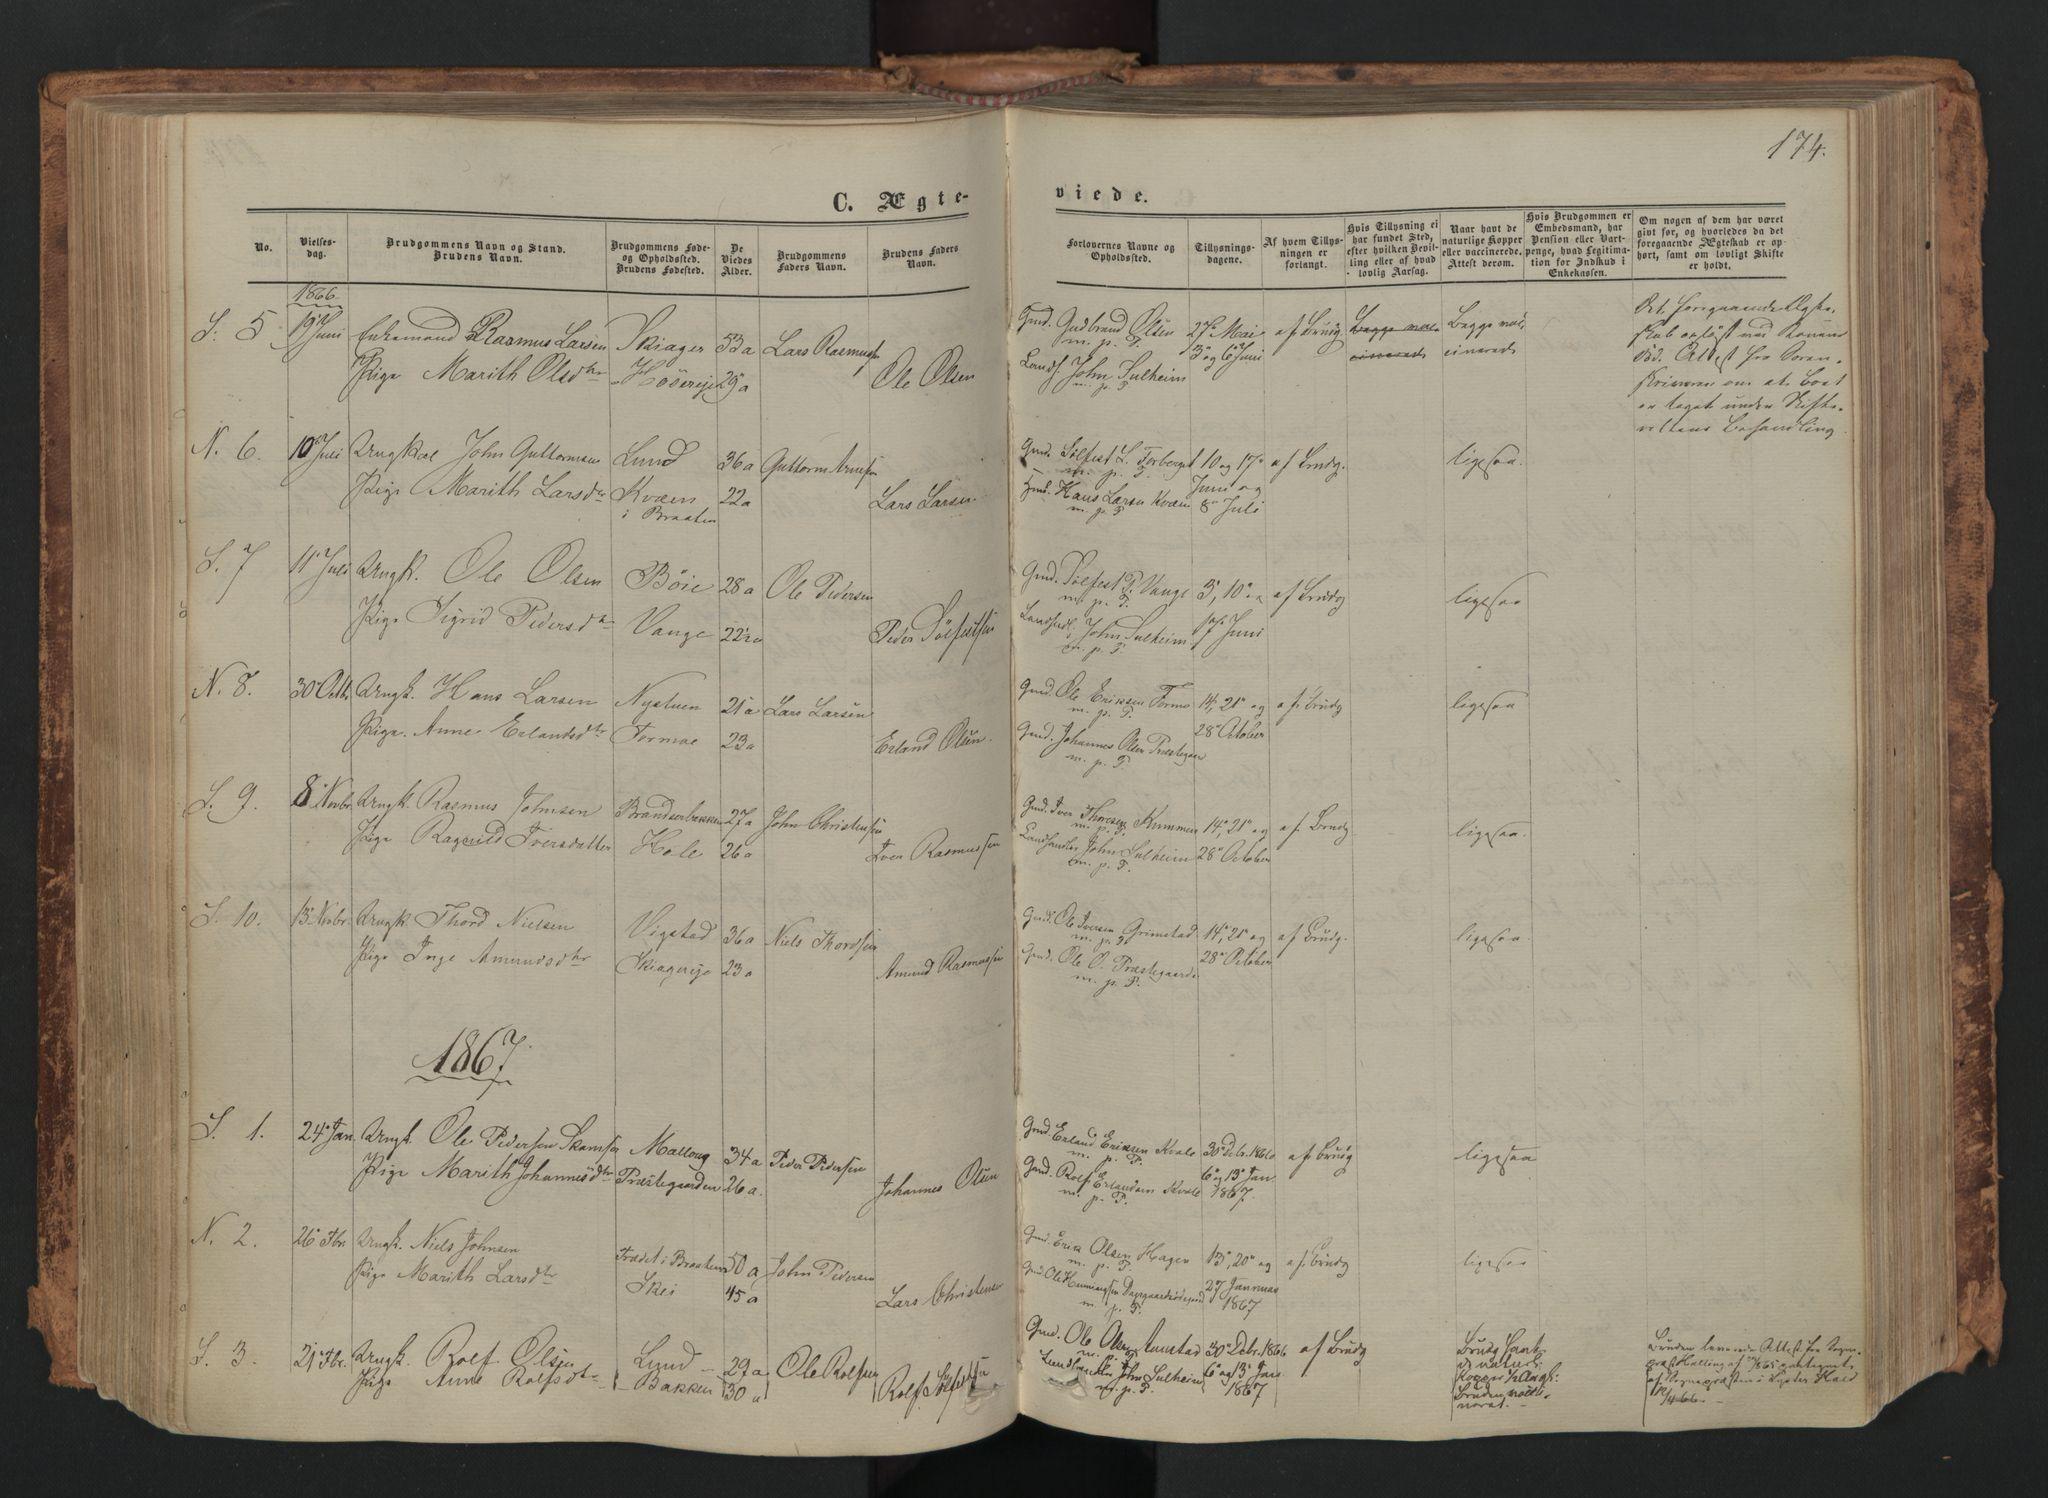 SAH, Skjåk prestekontor, Ministerialbok nr. 1, 1863-1879, s. 174